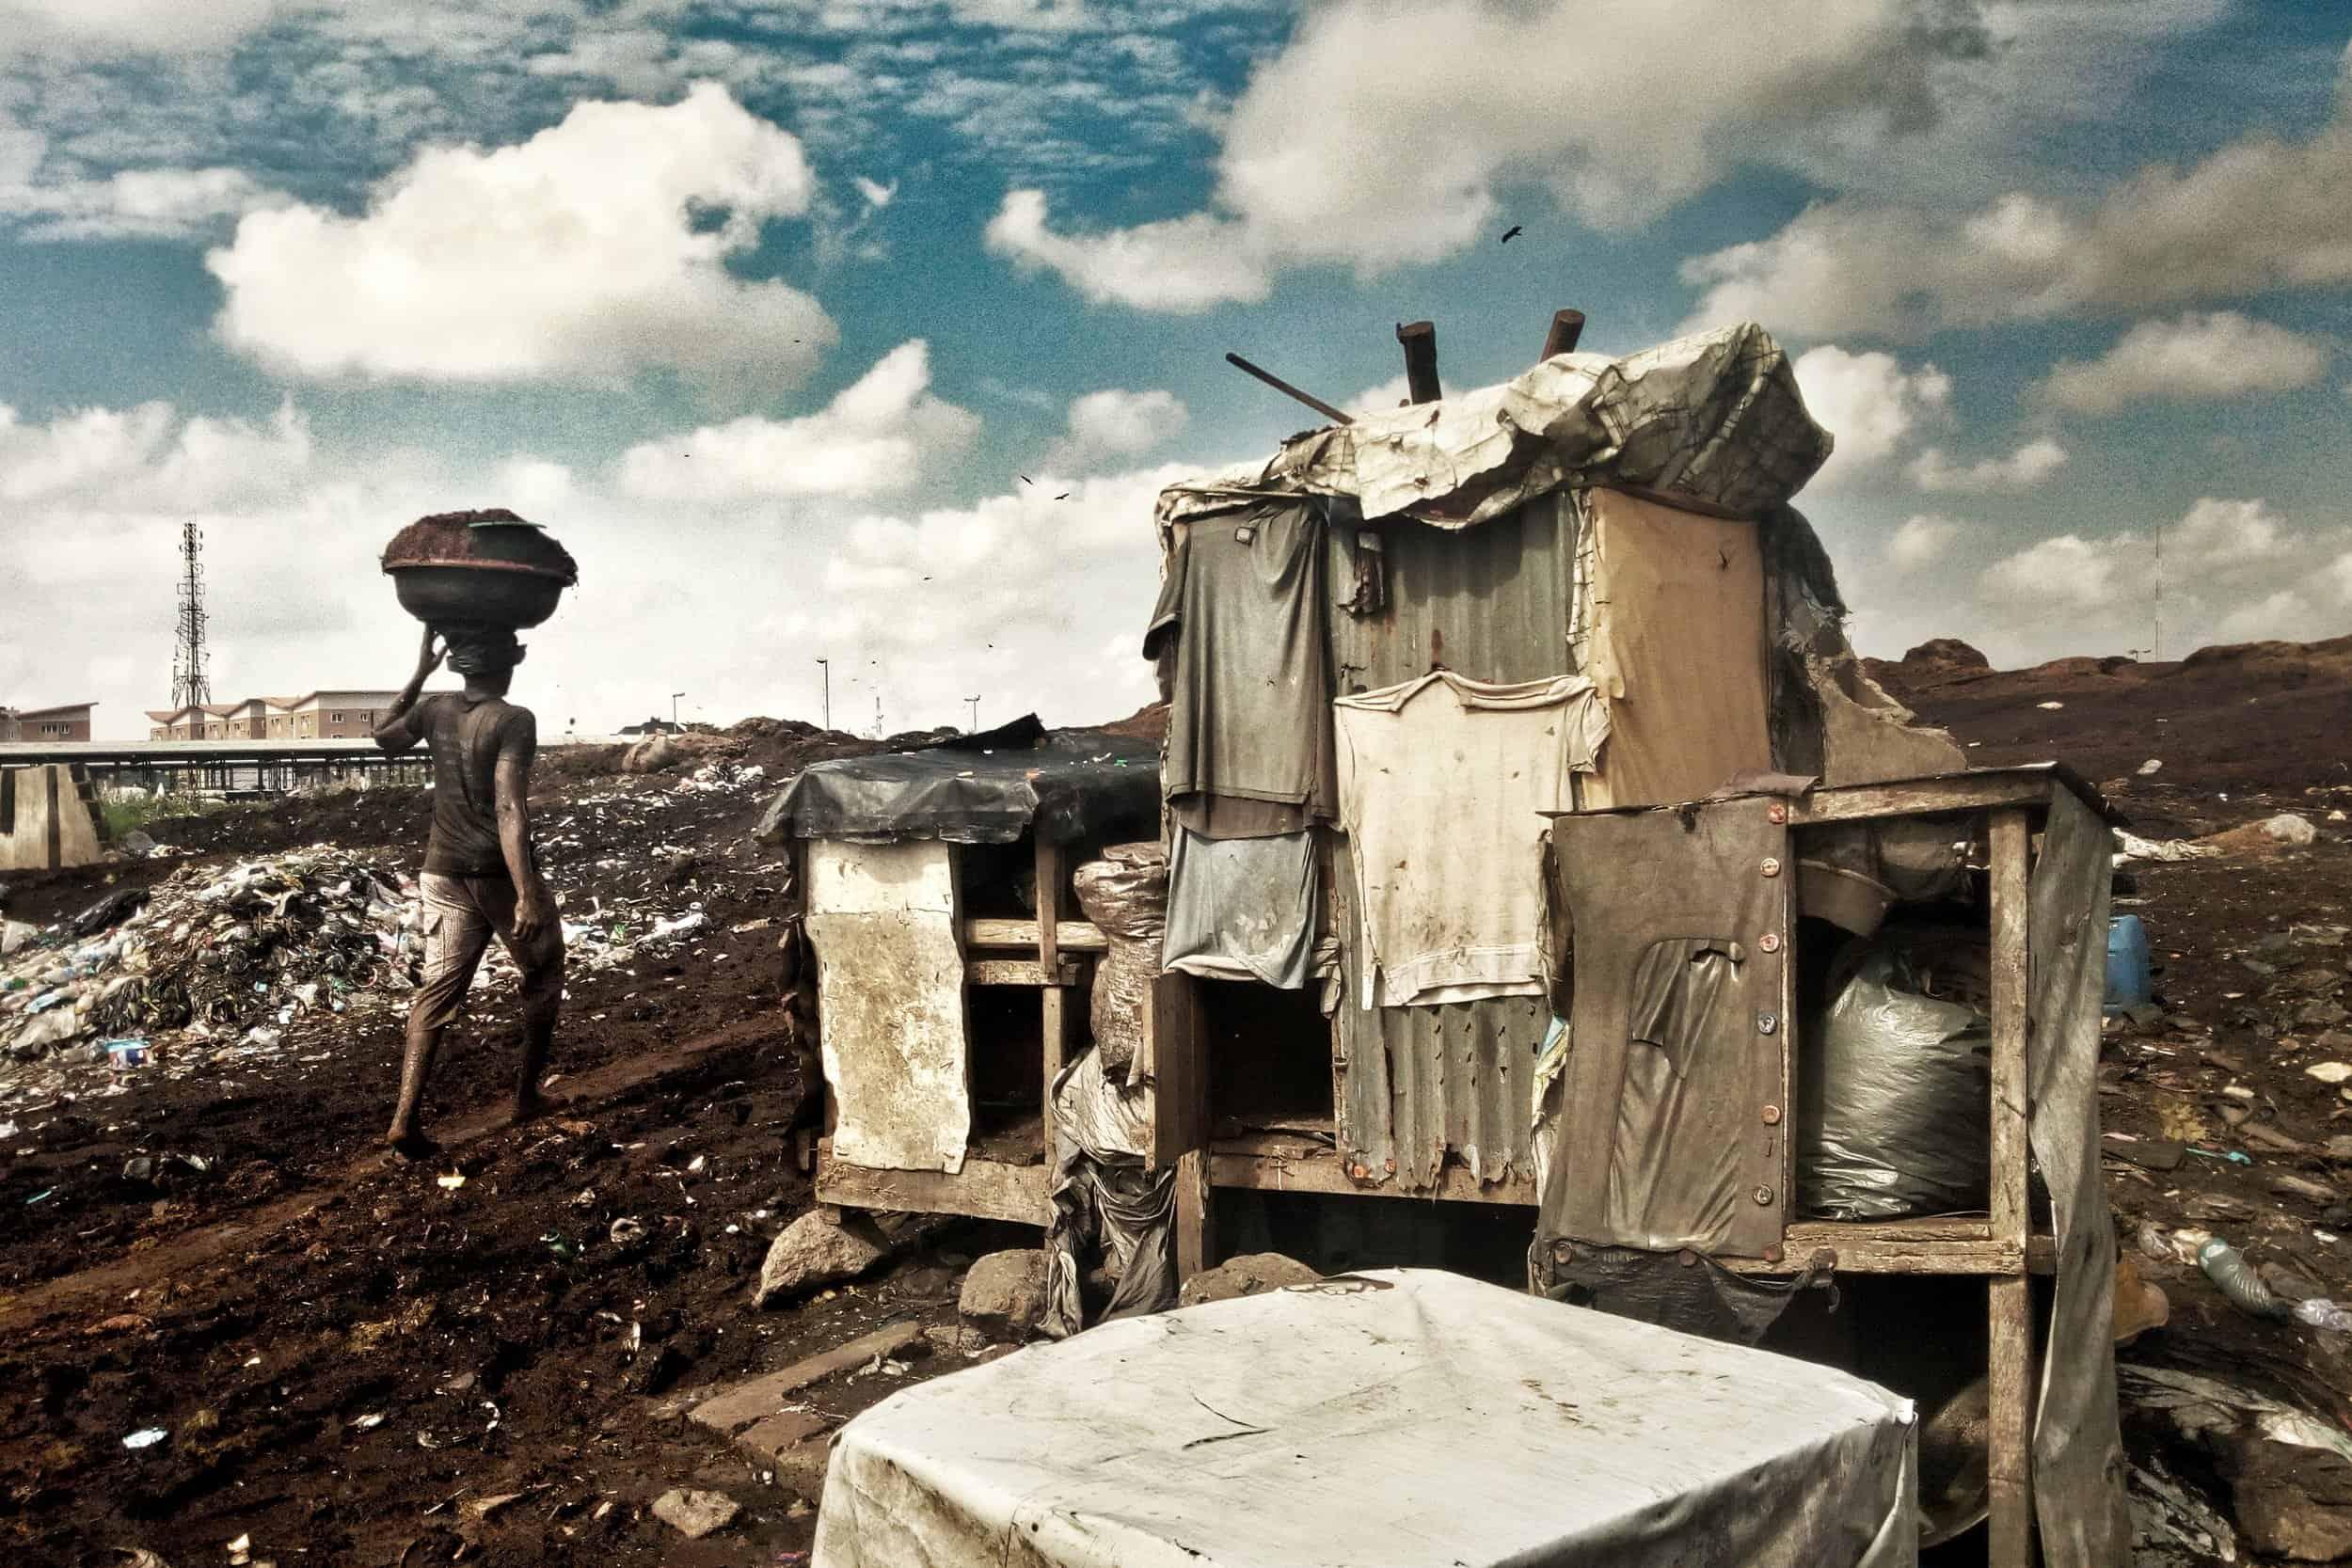 Covid-19 Chronicle Series: Access to Clean Water in Nairobi, Kenya